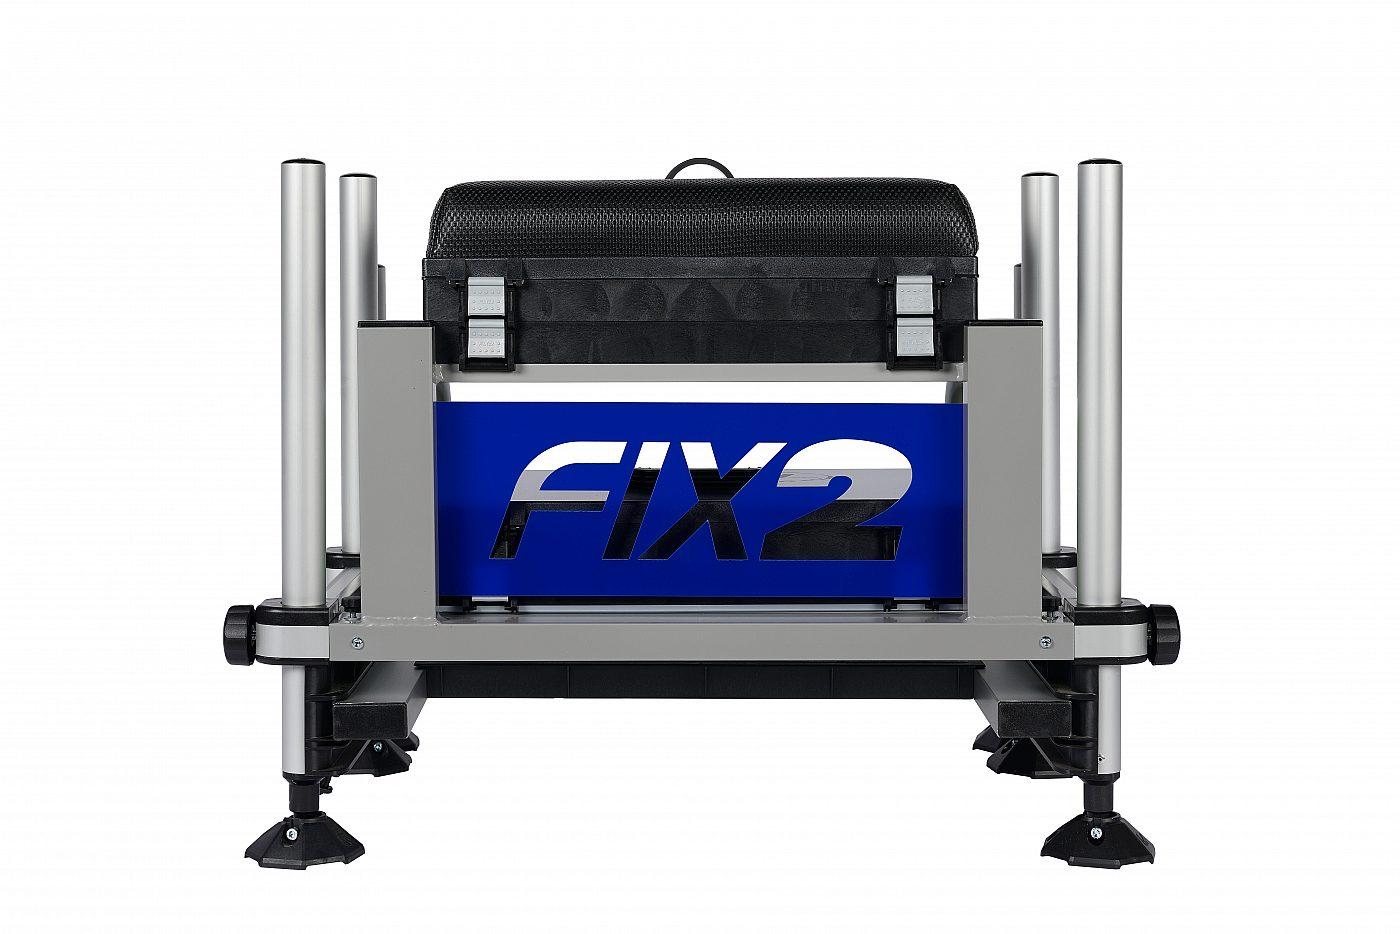 FCSX4 36 GREBLU back